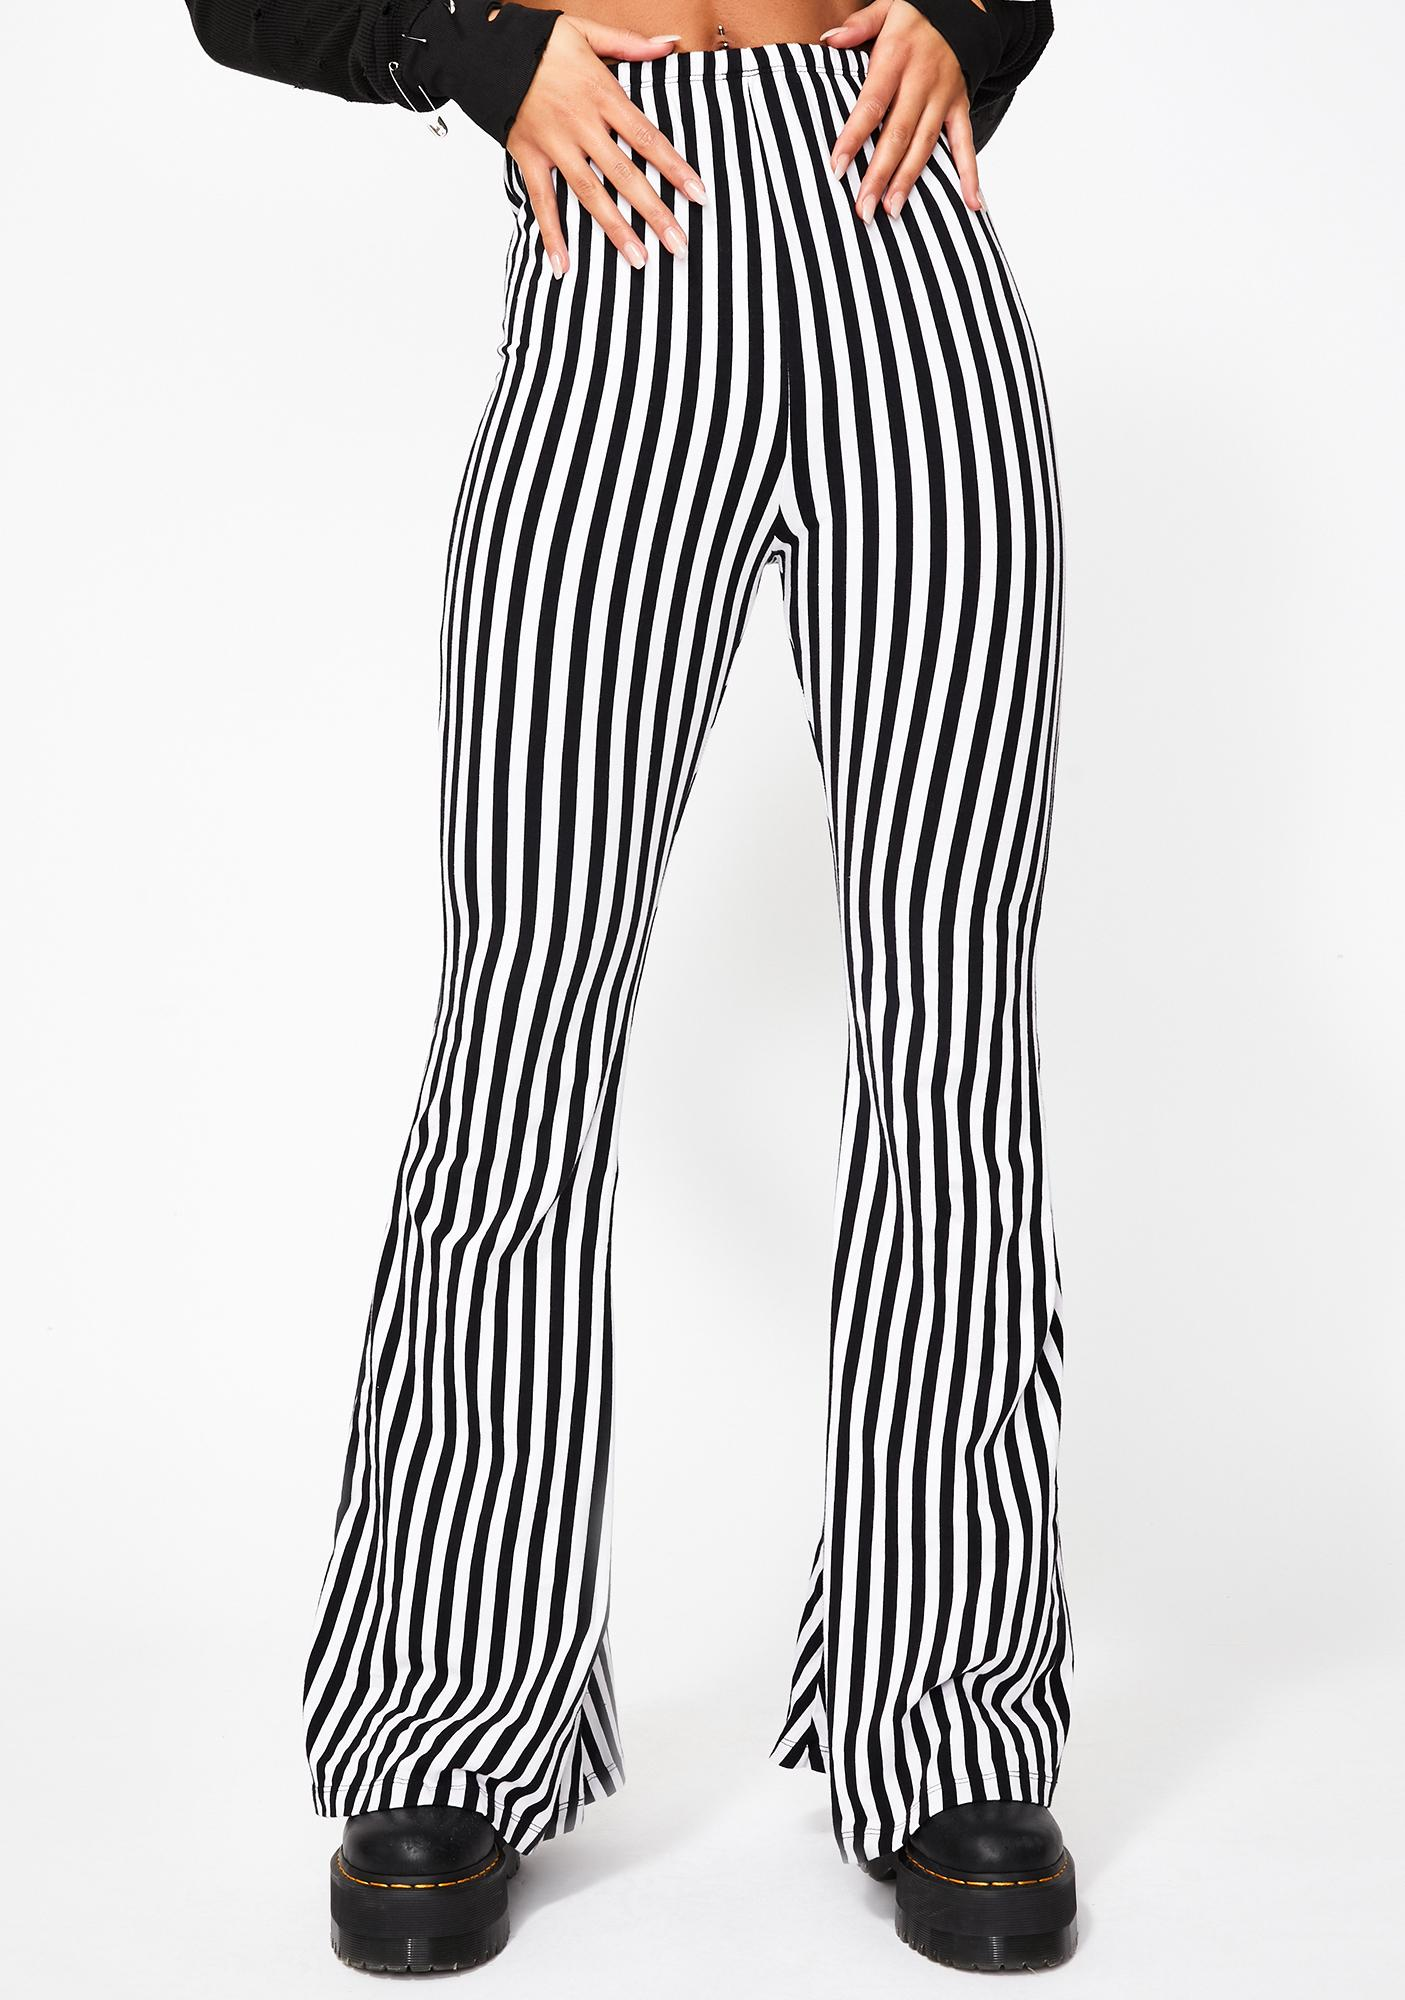 The People VS Malibu Stripe Stella Flares